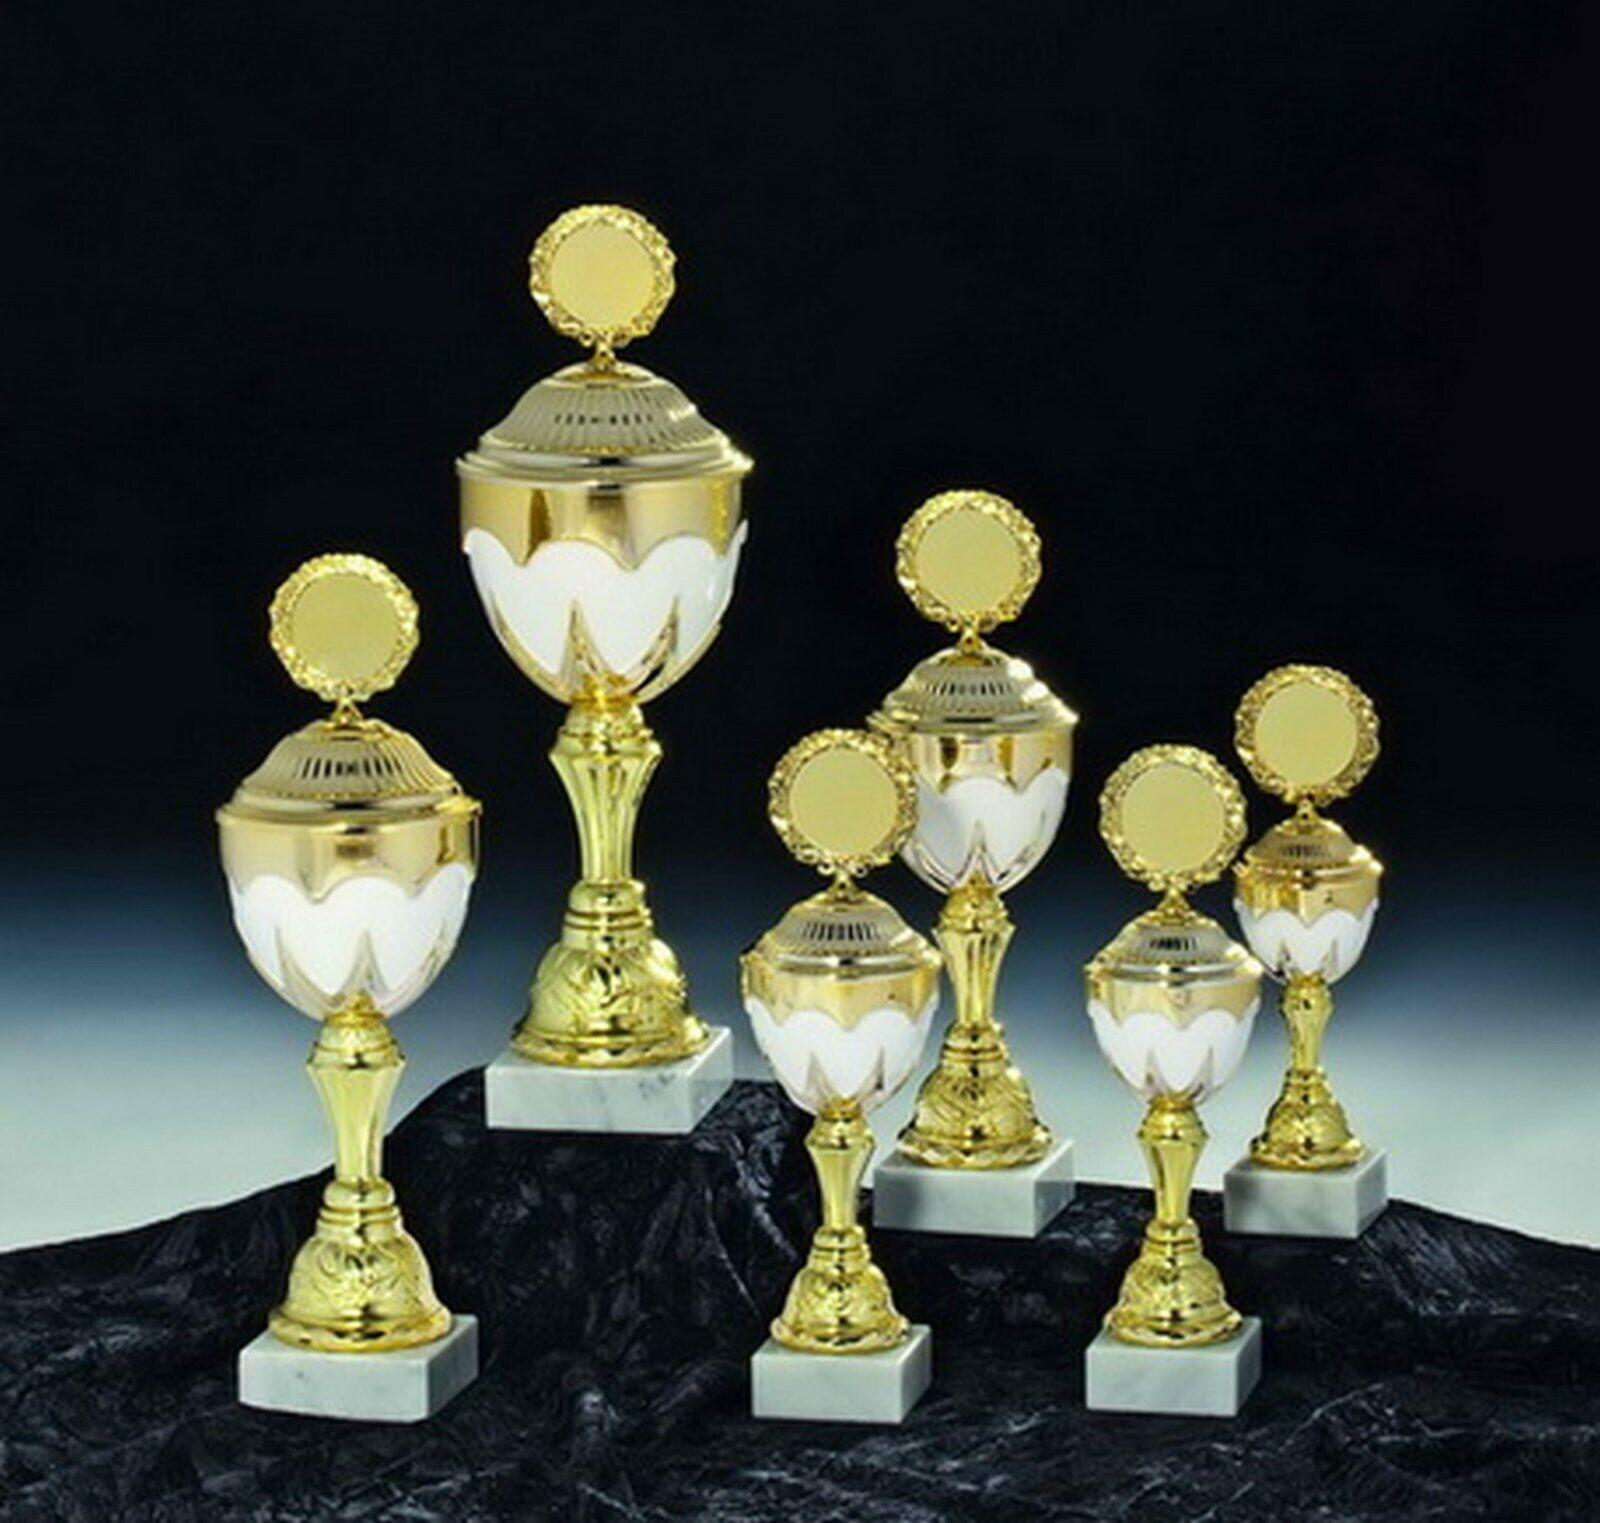 3er serie trofeos con emblema + grabado 43 39 35cm  k949 (filosofar trofeo ganador)